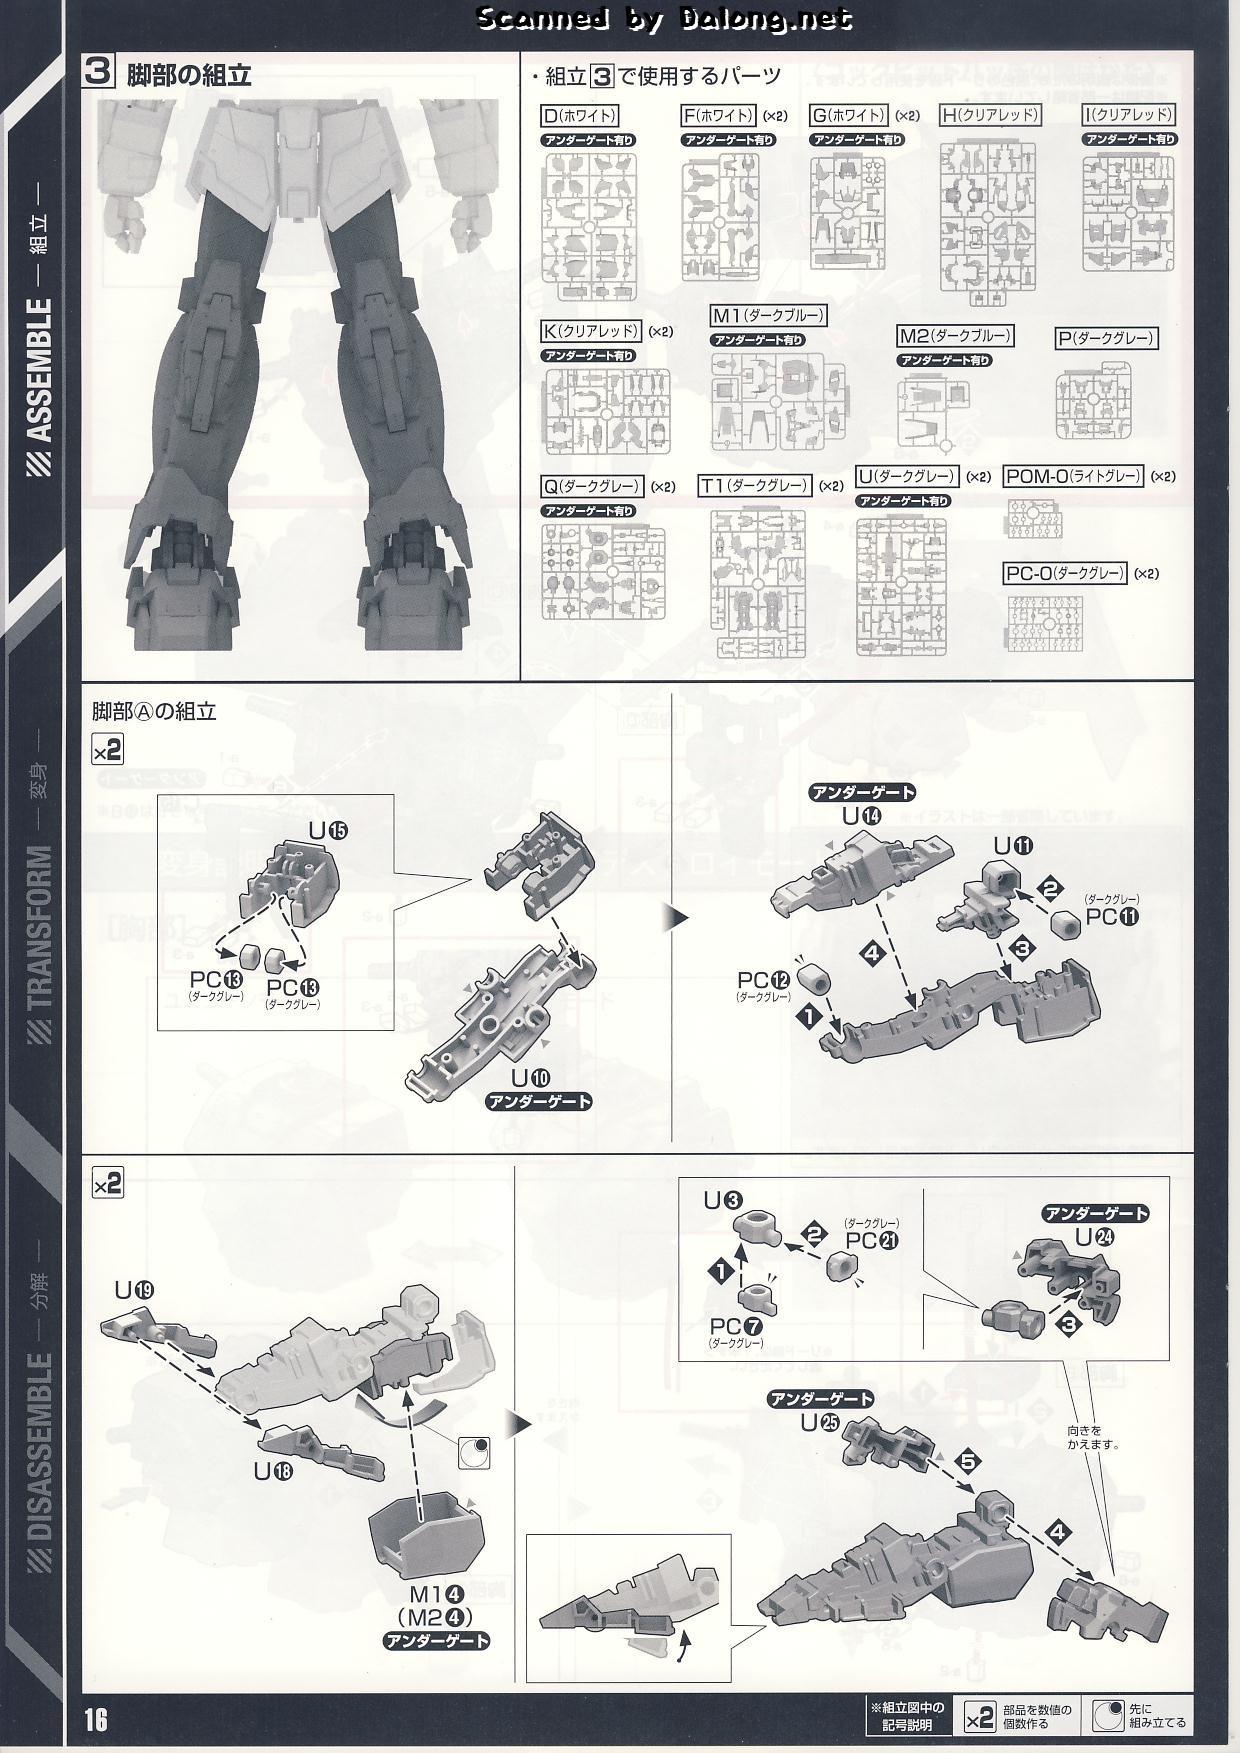 PG15独角兽高达说明16.JPG